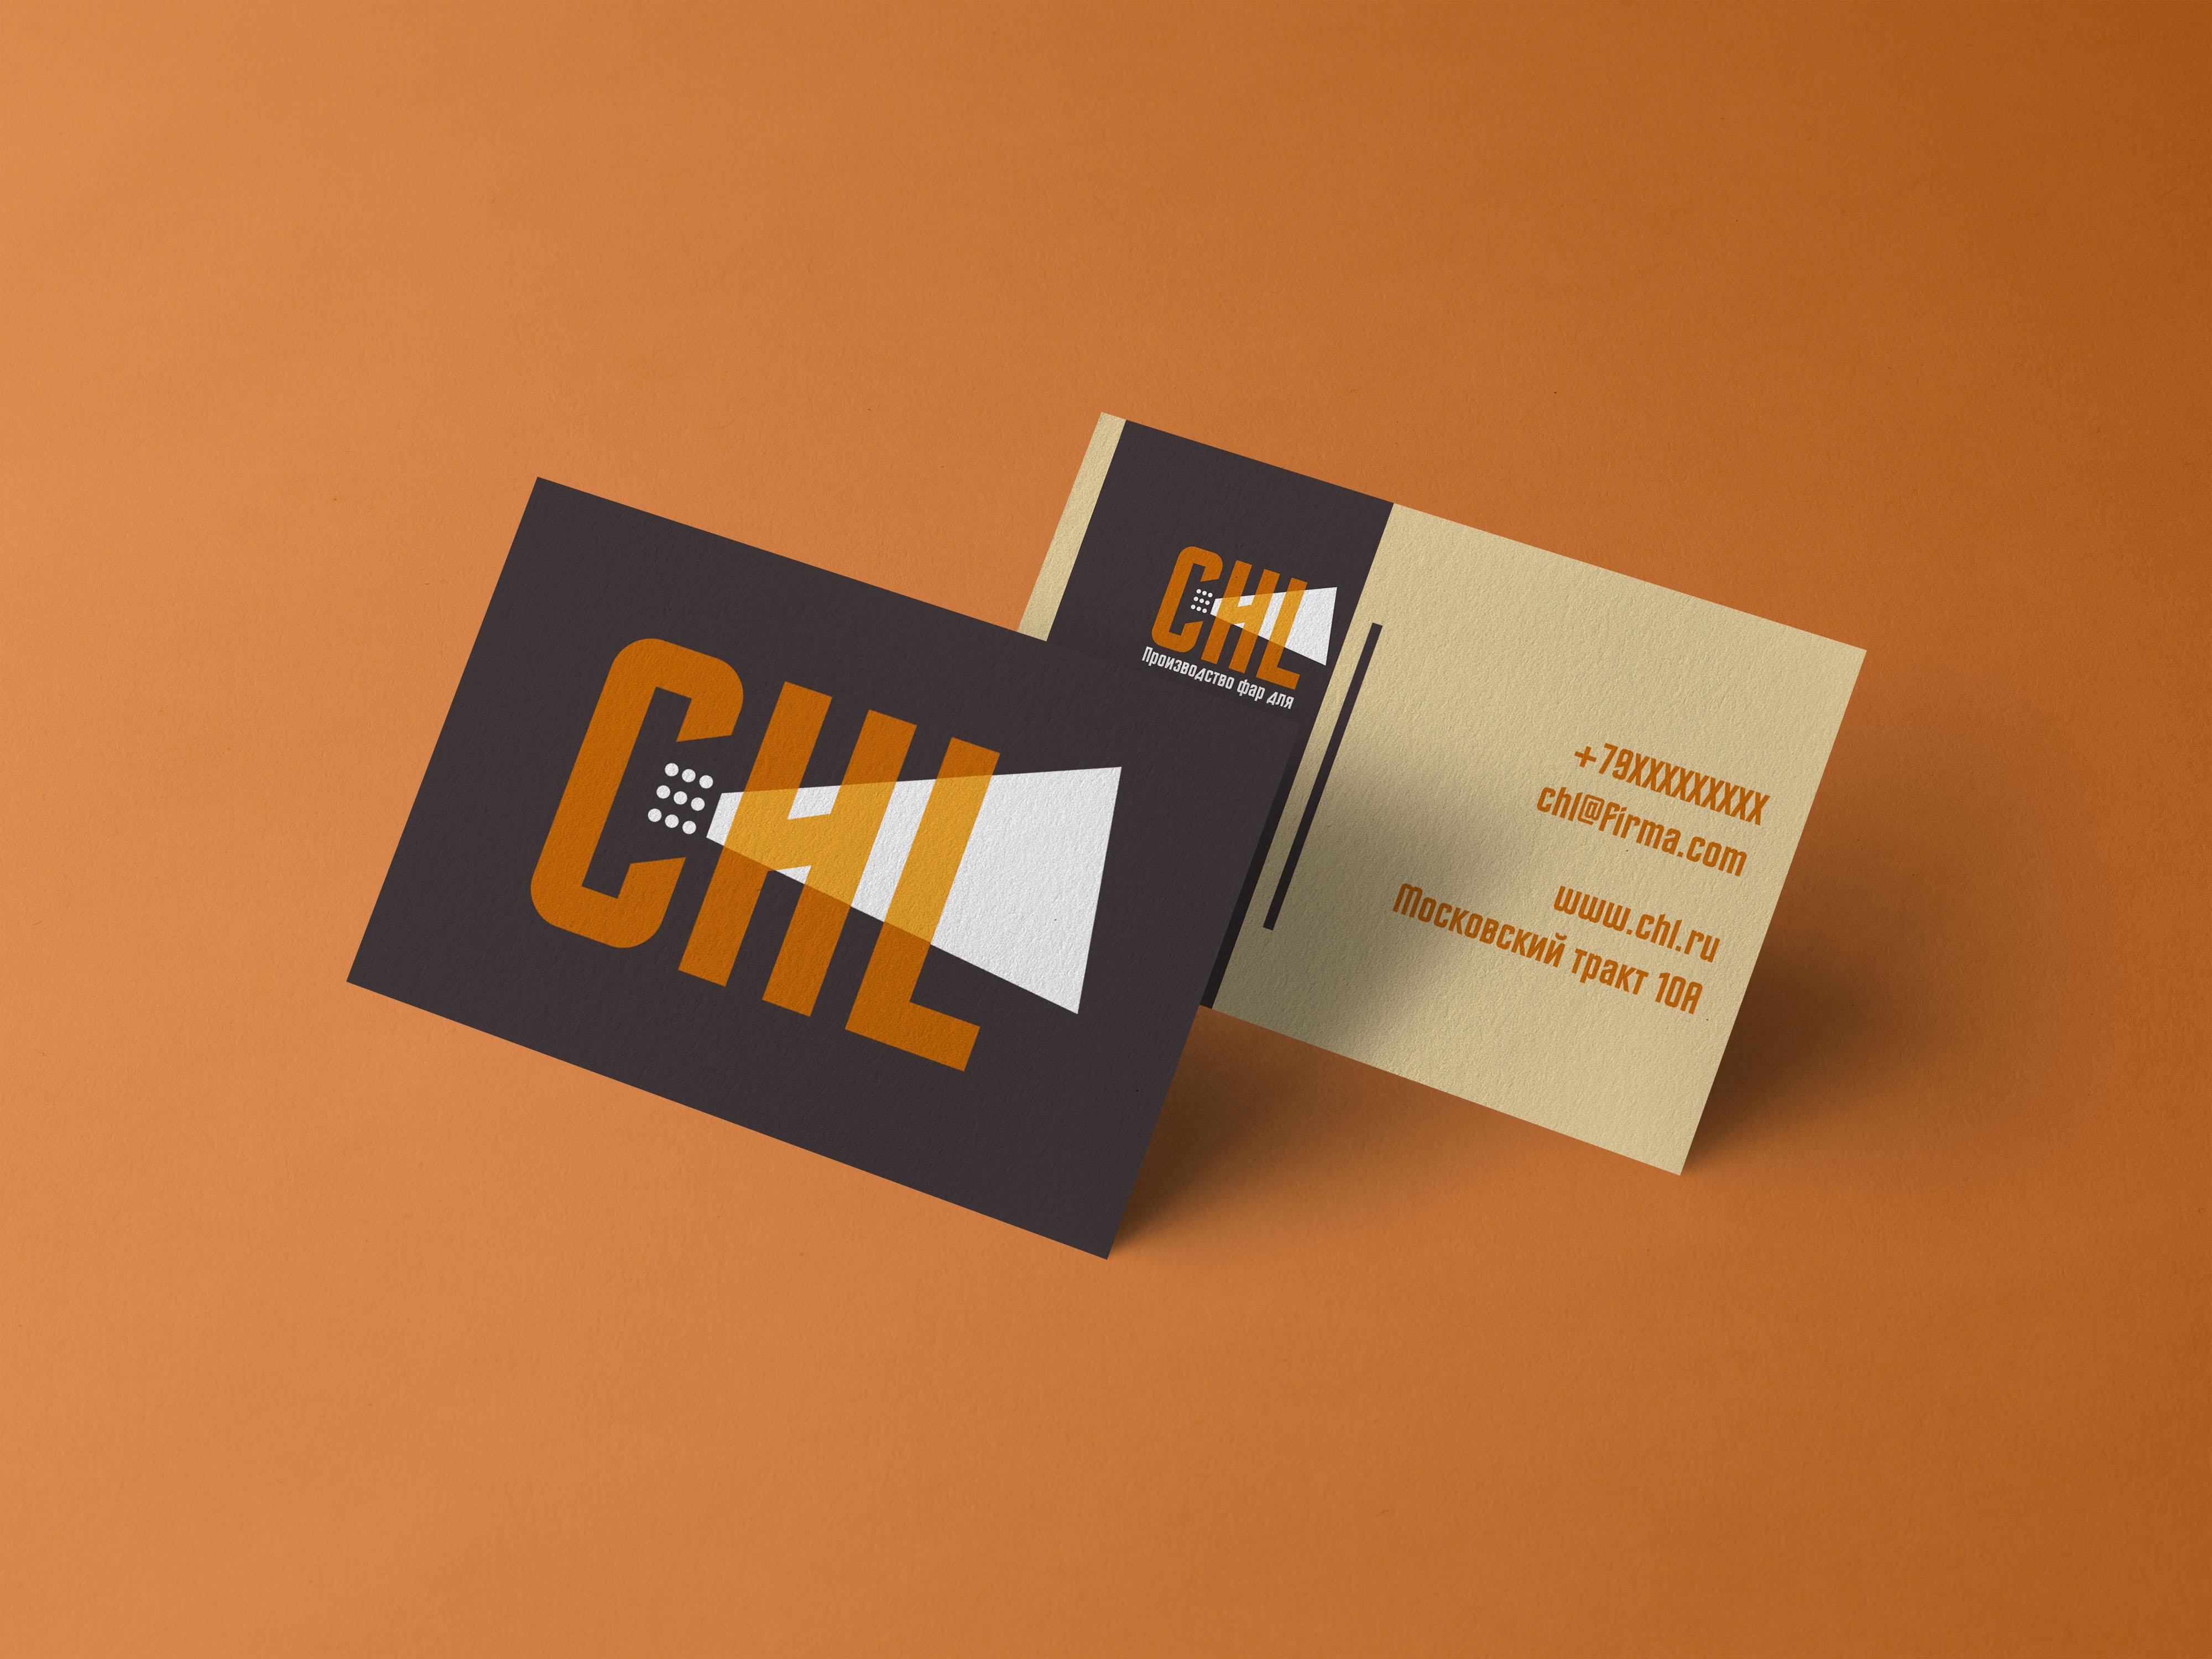 разработка логотипа для производителя фар фото f_4705f5b38da7697c.jpg